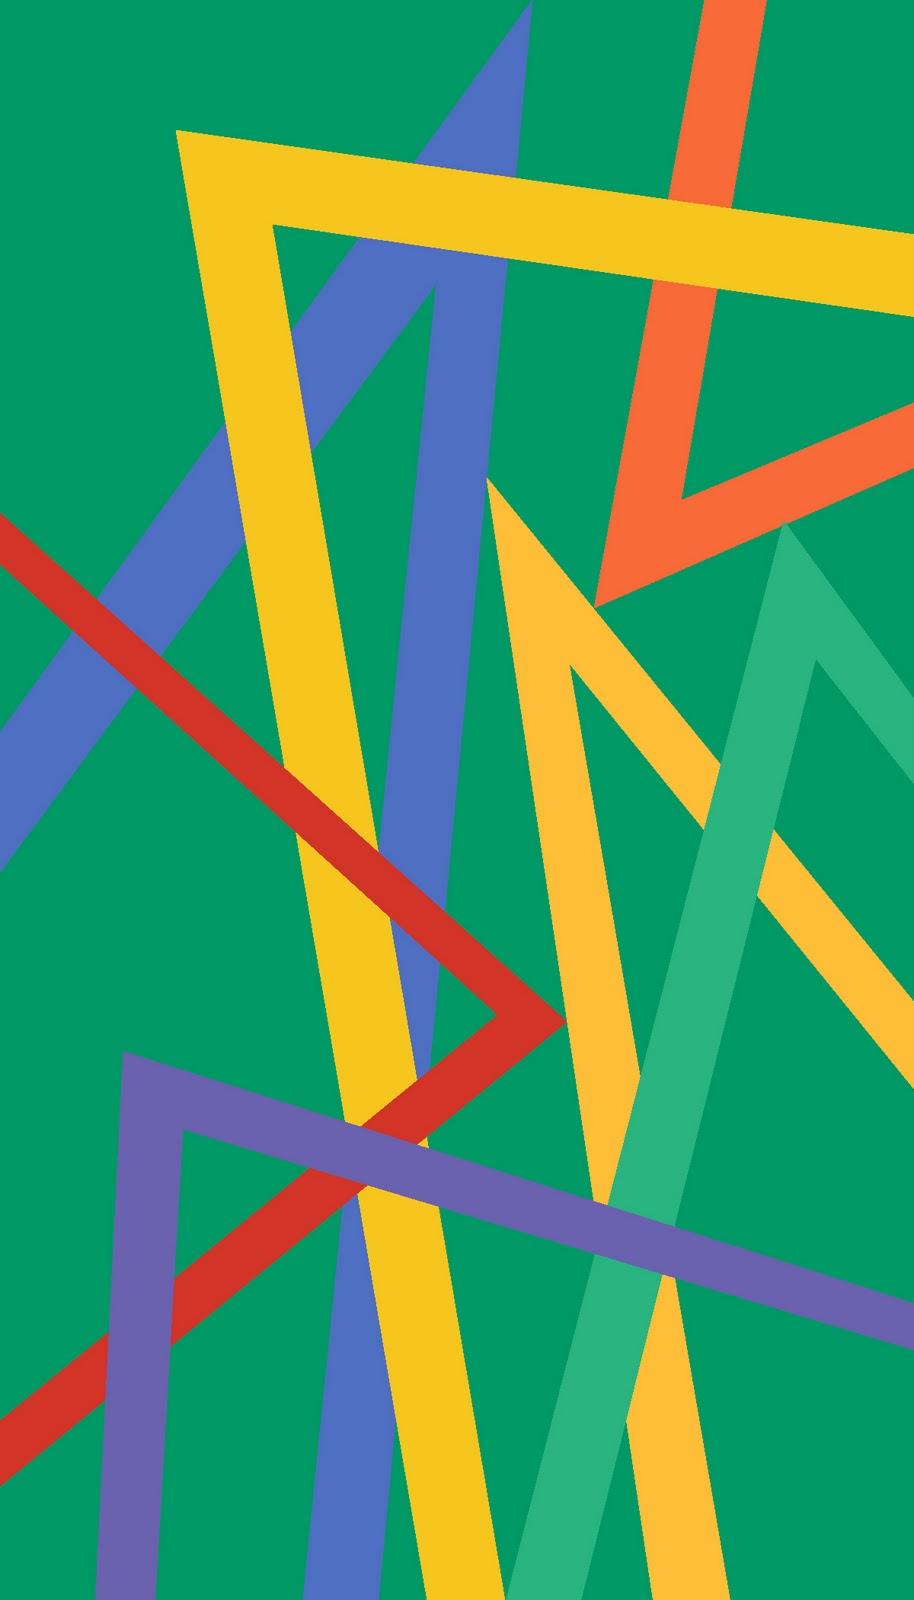 Chelsea 39 s graphic design blog december 2010 - Split complementary color scheme ...